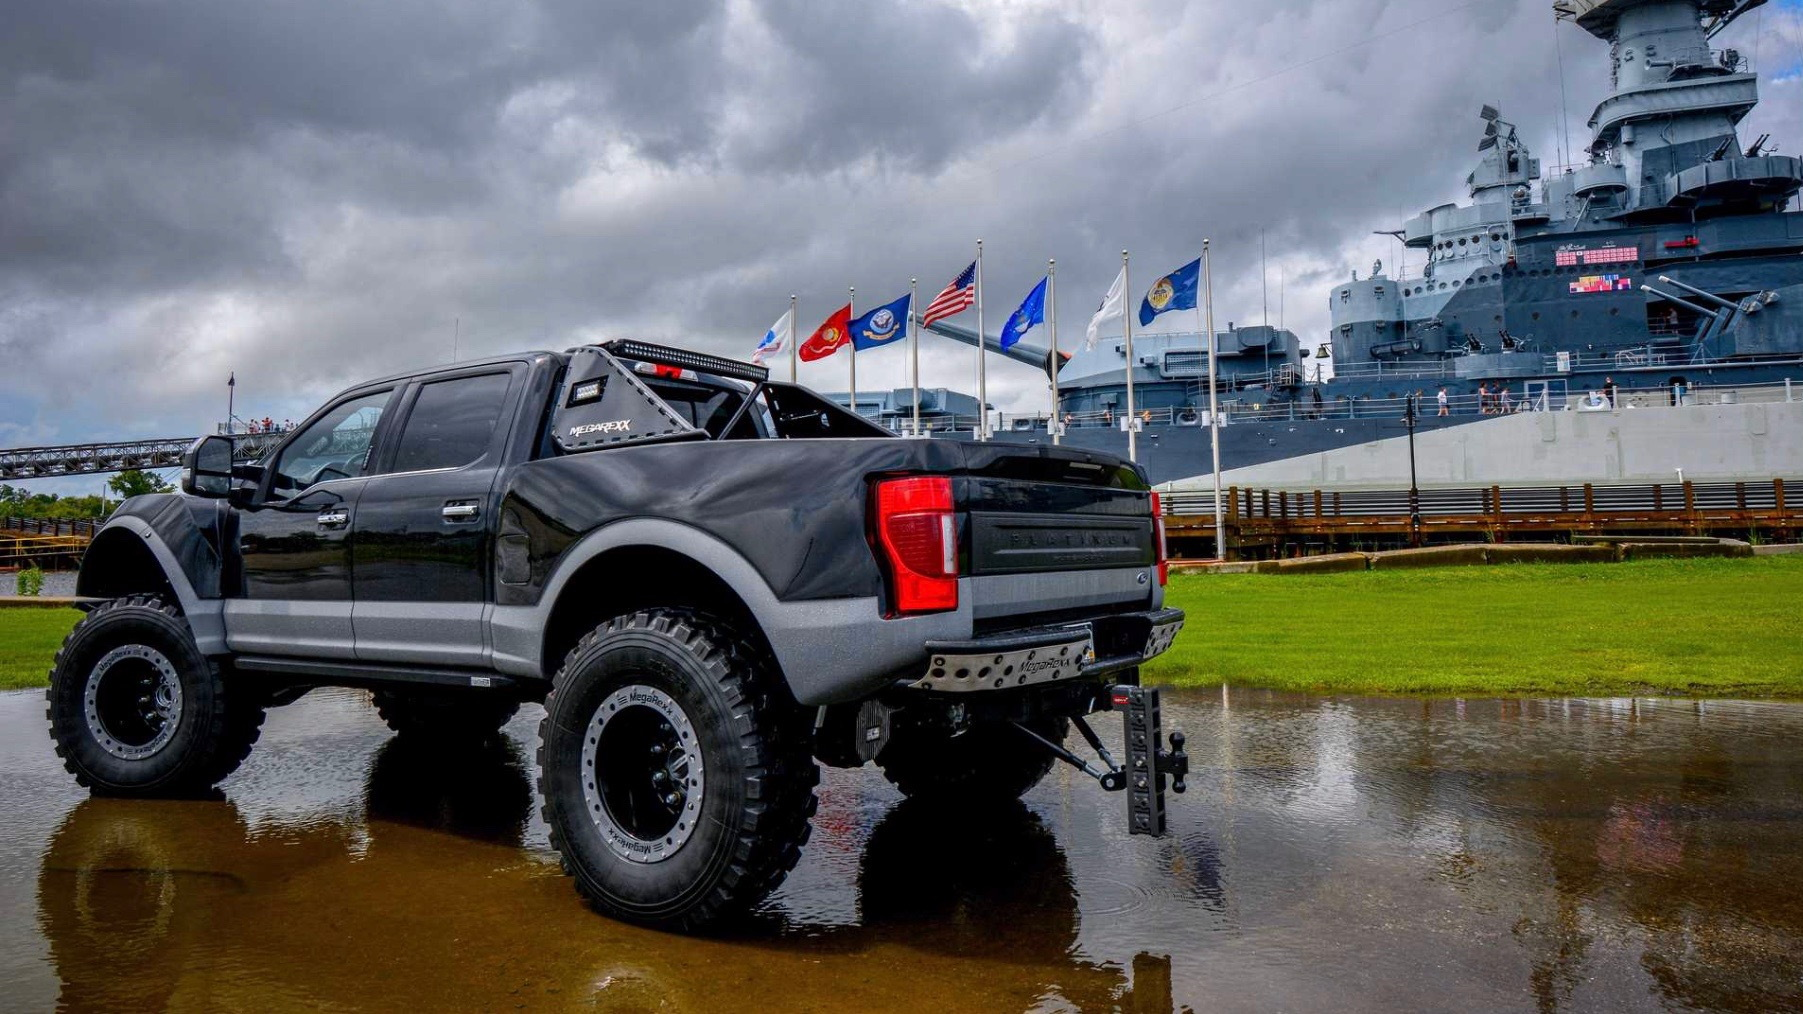 MegaRexx MegaRaptor Ford Super Duty F-250